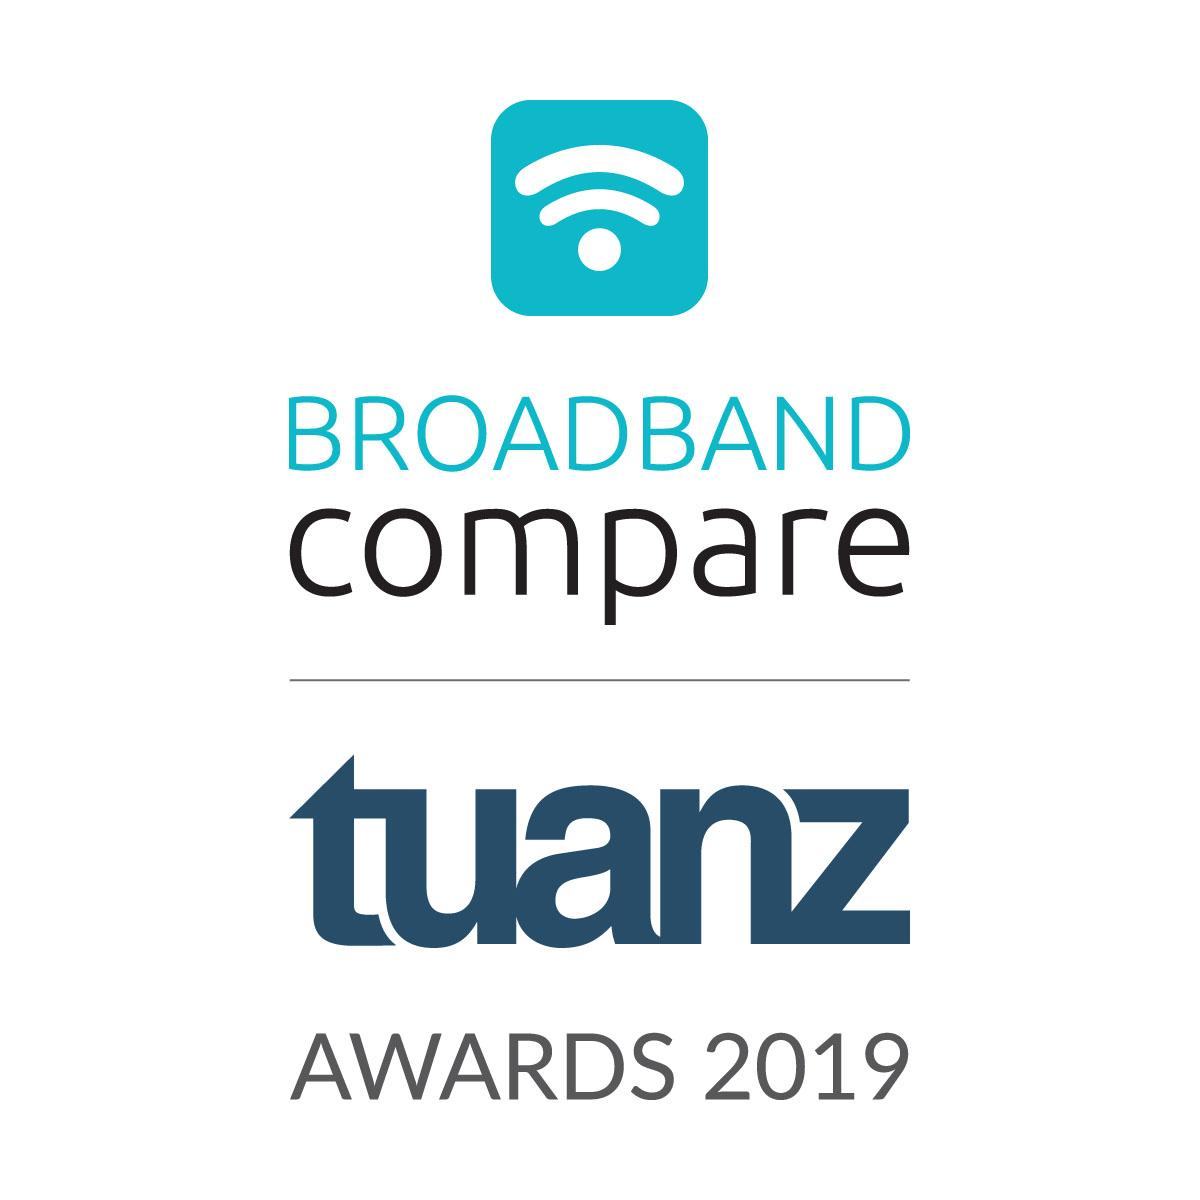 Broadband Compare TUANZ Awards 2019